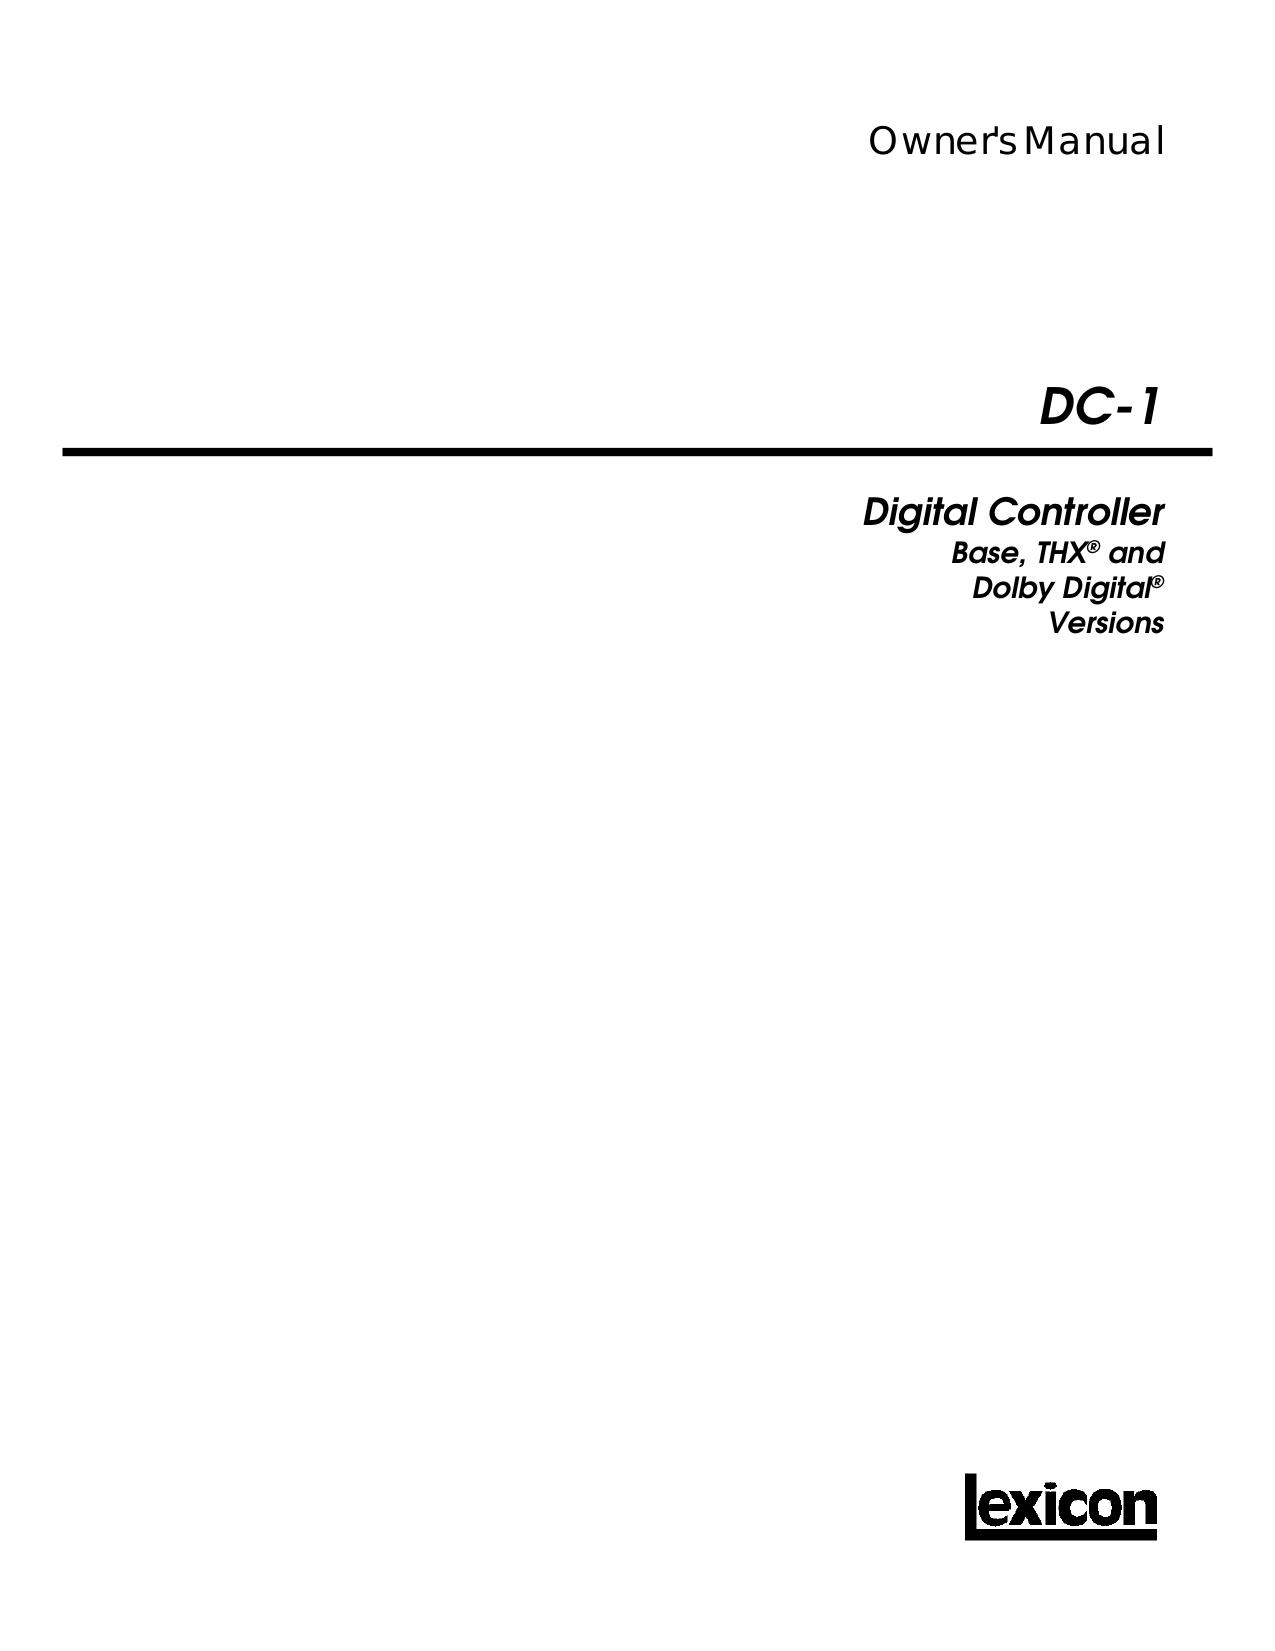 pdf for Lexicon Receiver DC-1 manual